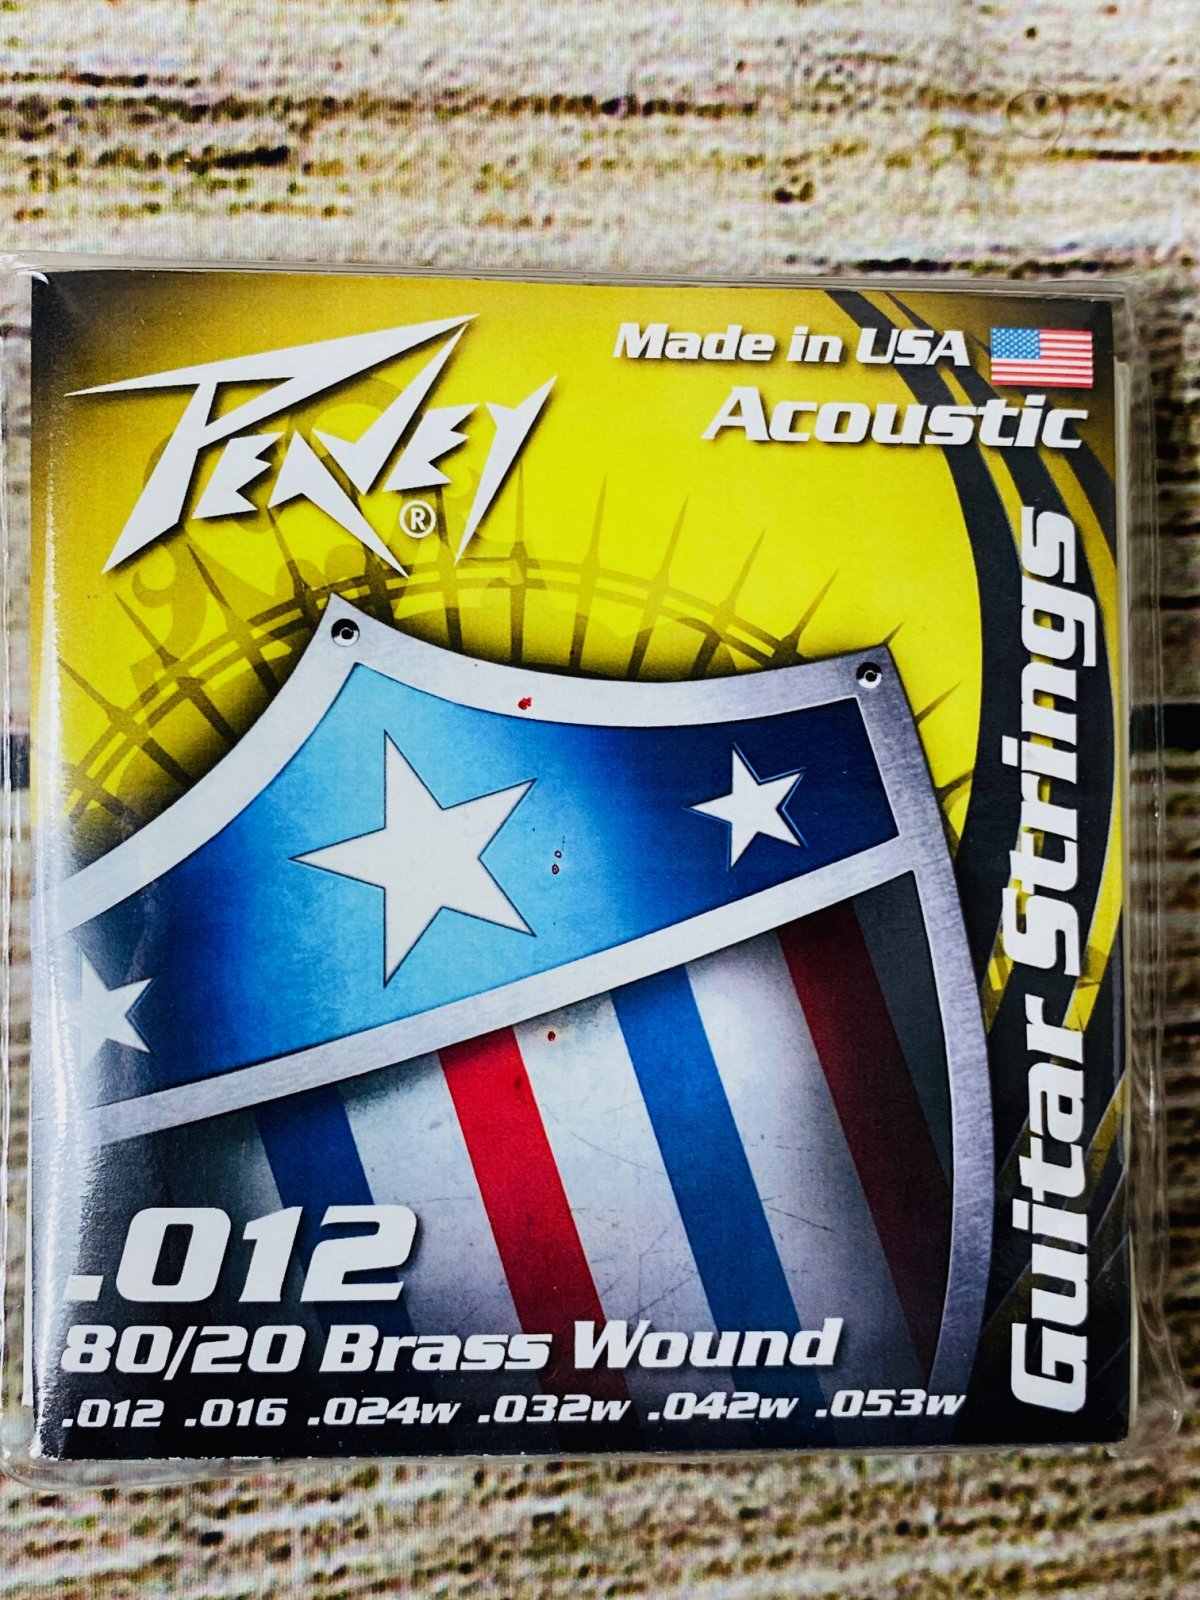 Peavey Phosphor Bronze-Wound Acoustic Guitar Strings 12s